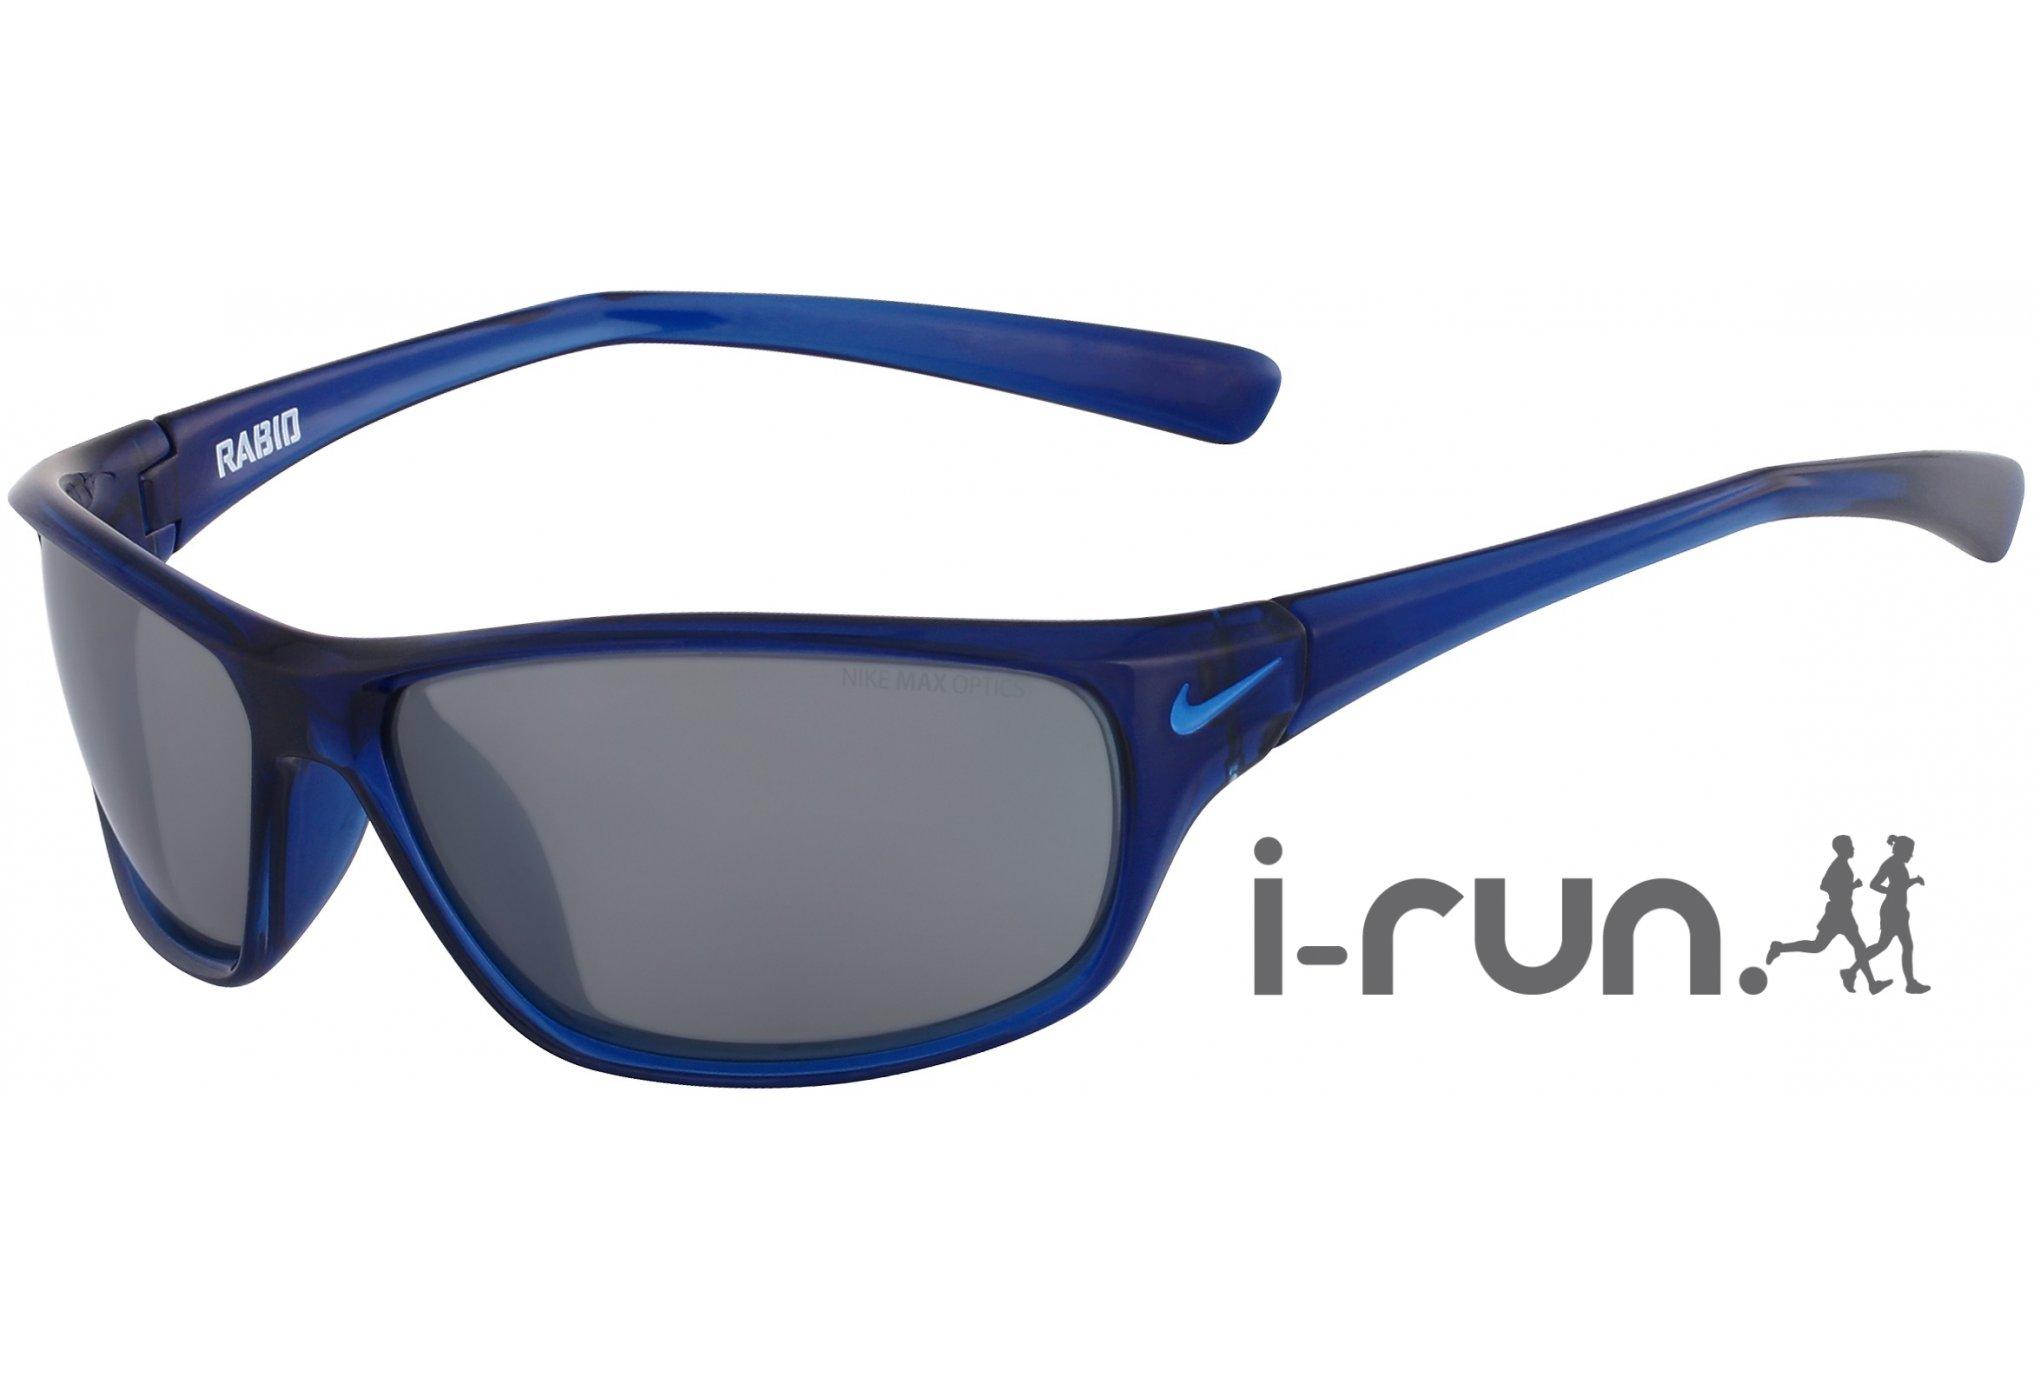 Nike Lunettes Rabid Lunettes